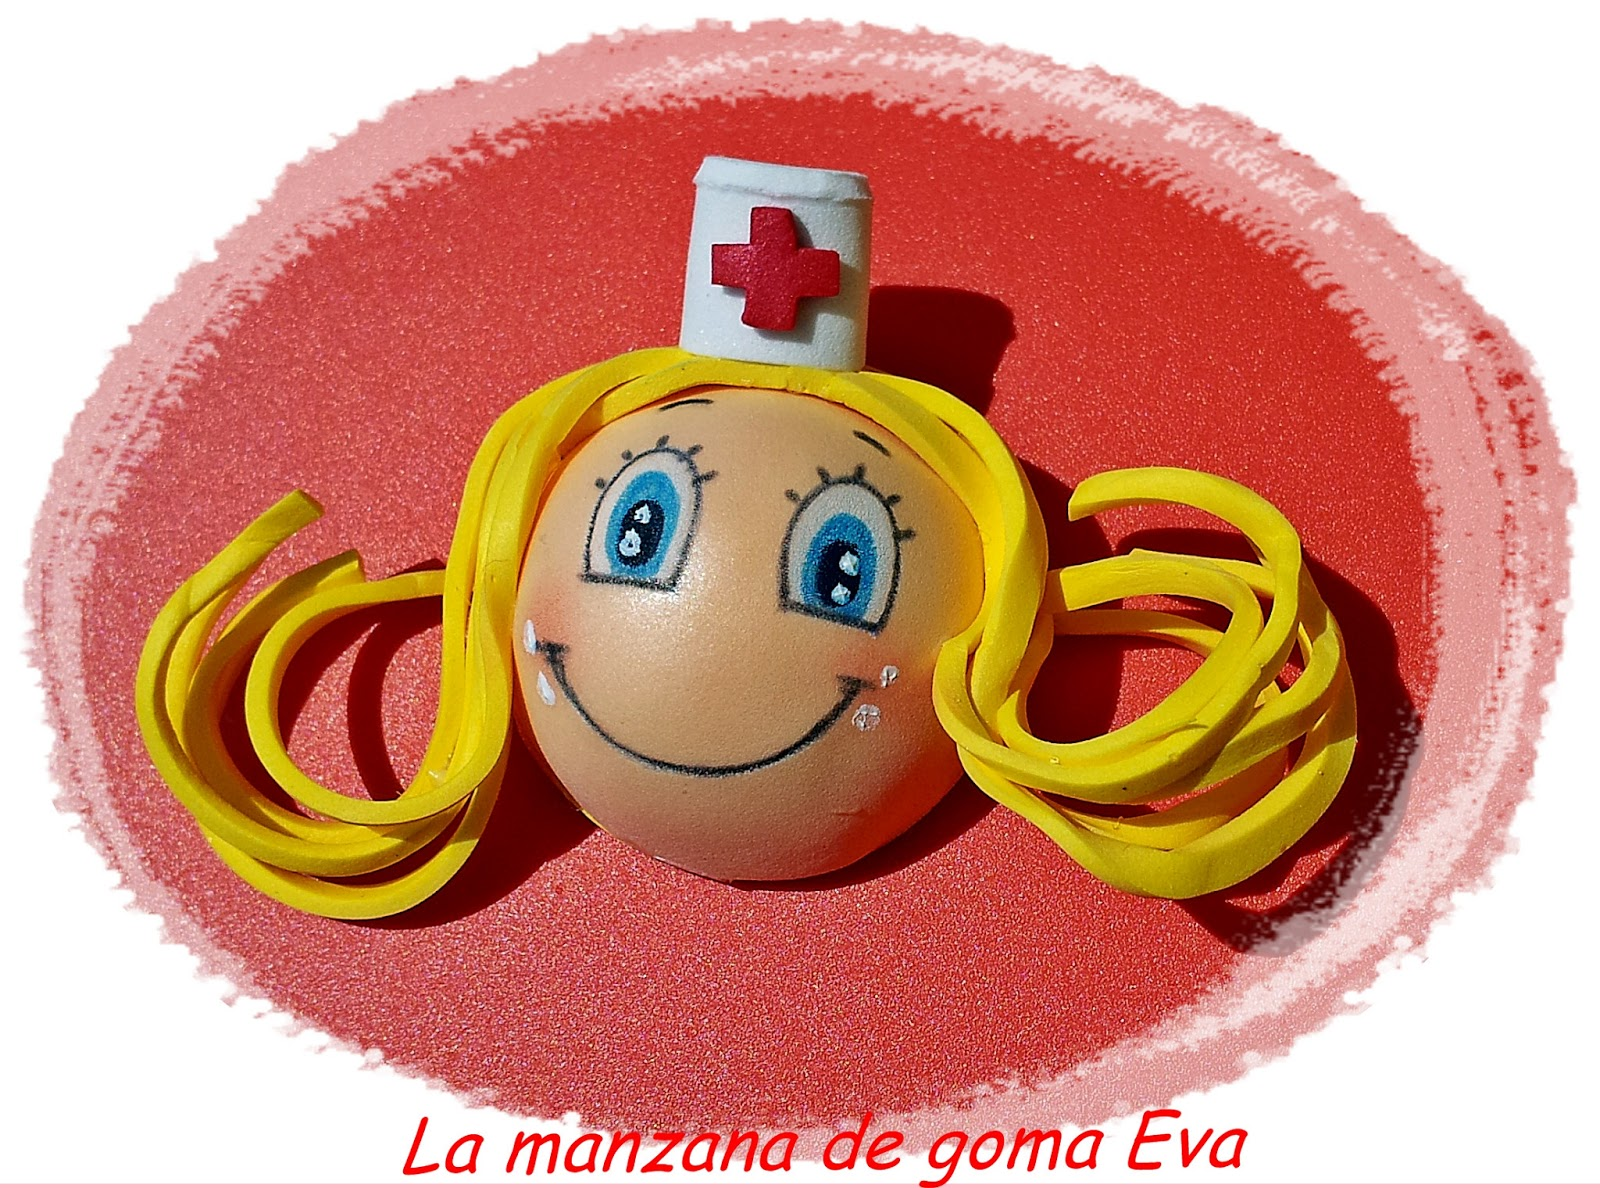 Manzana Goma Eva Broches Enfermeras